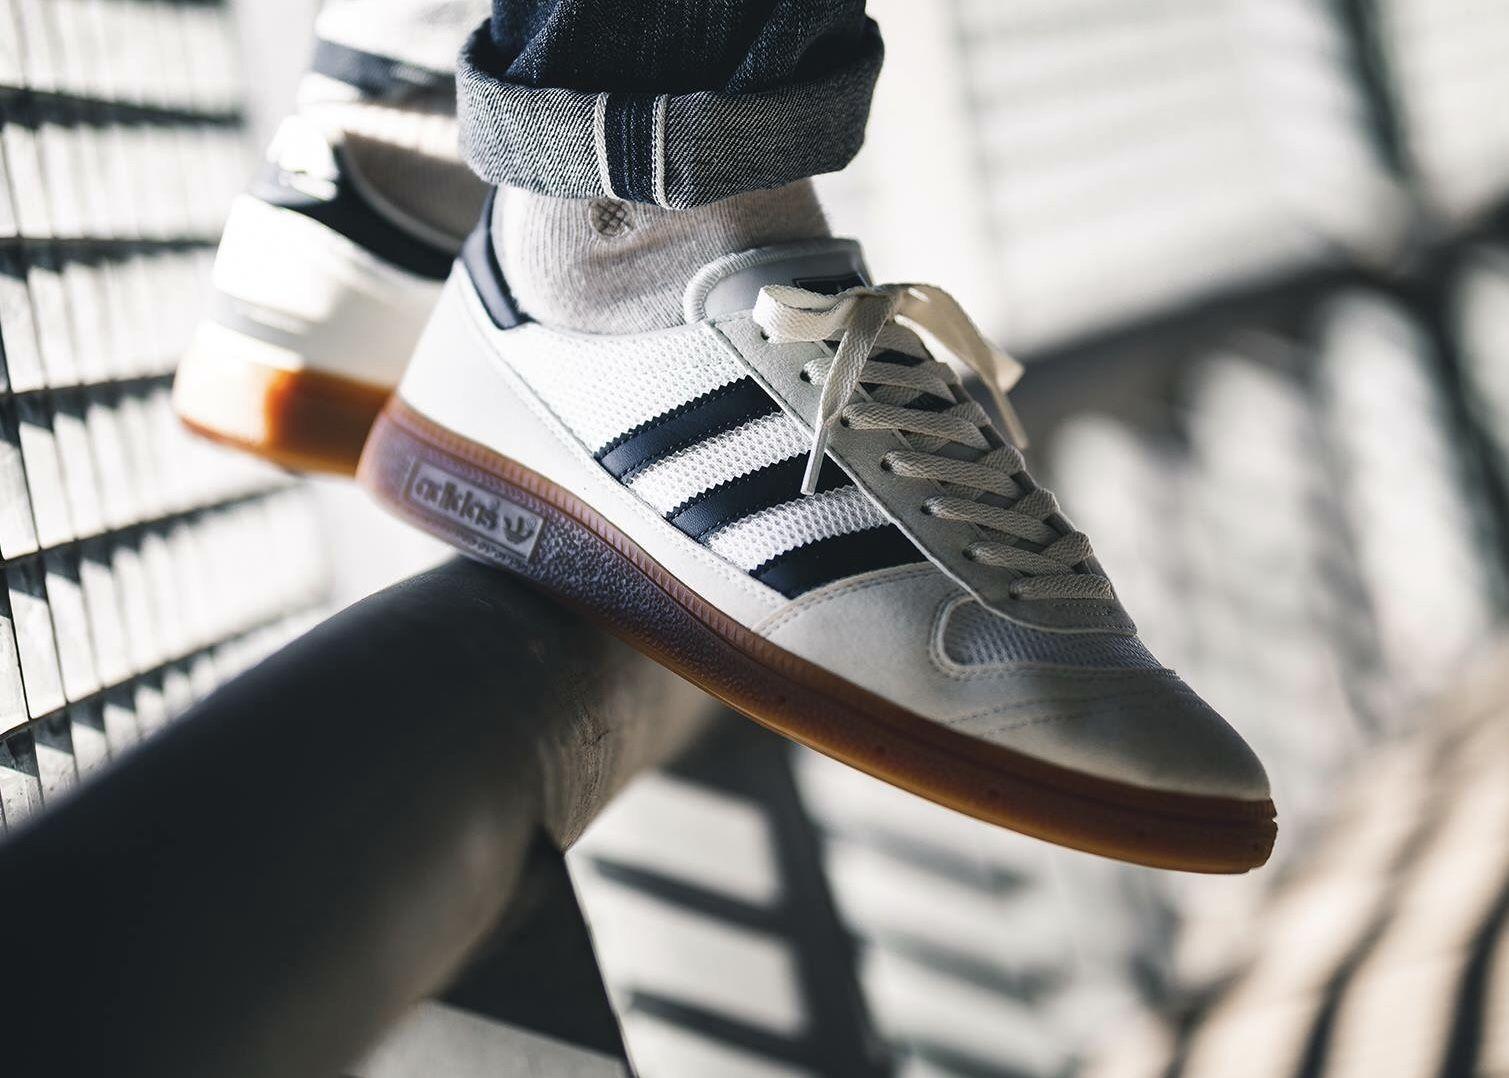 Adidas Premium Handball Spezial Caminar Zapatillas de